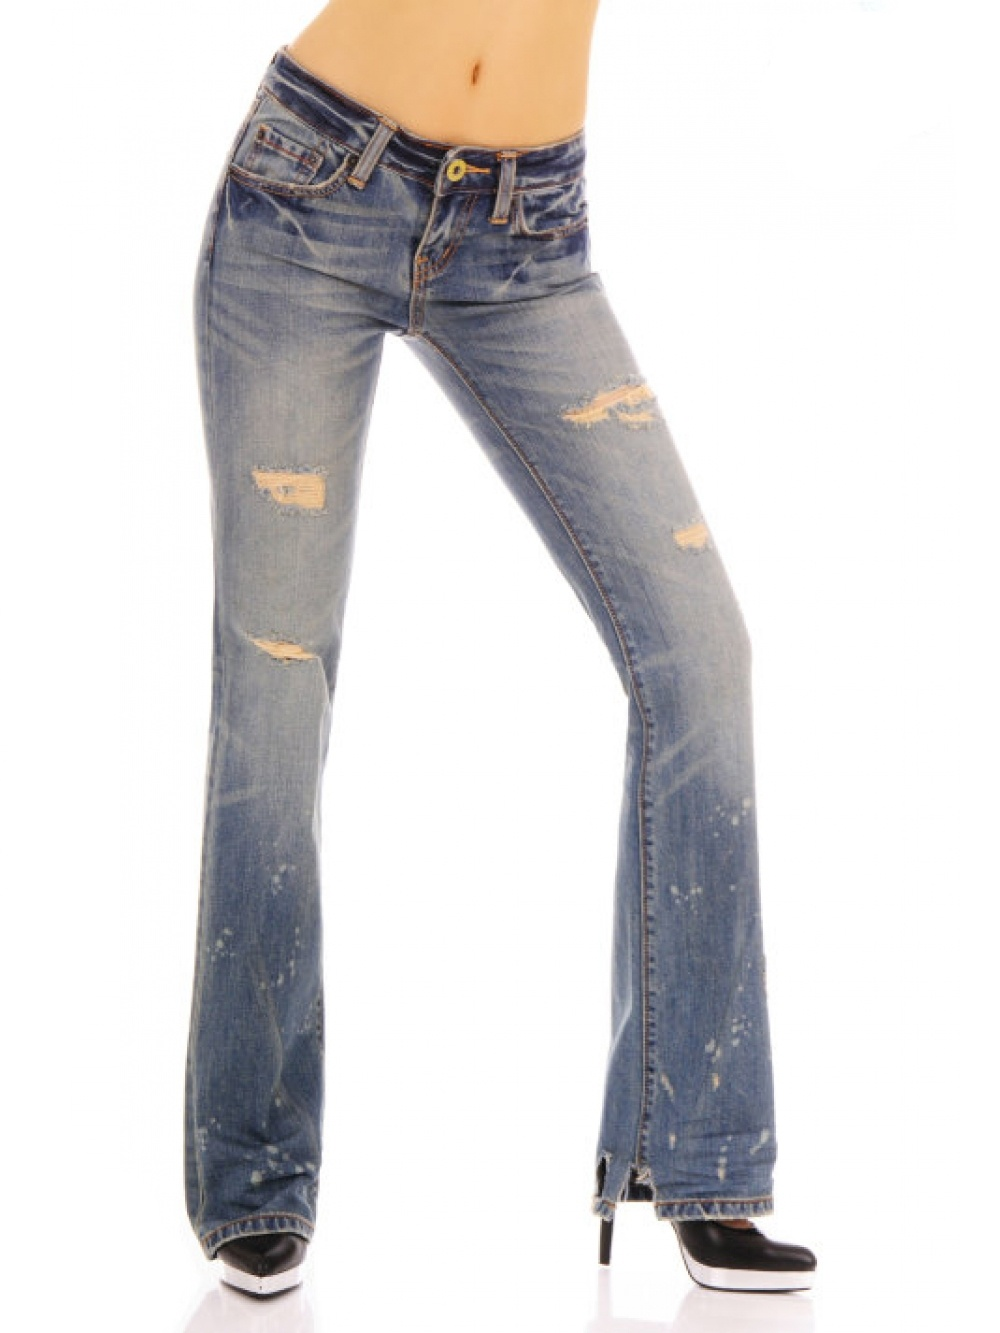 christian audigier damen strass jeans christian audigier. Black Bedroom Furniture Sets. Home Design Ideas